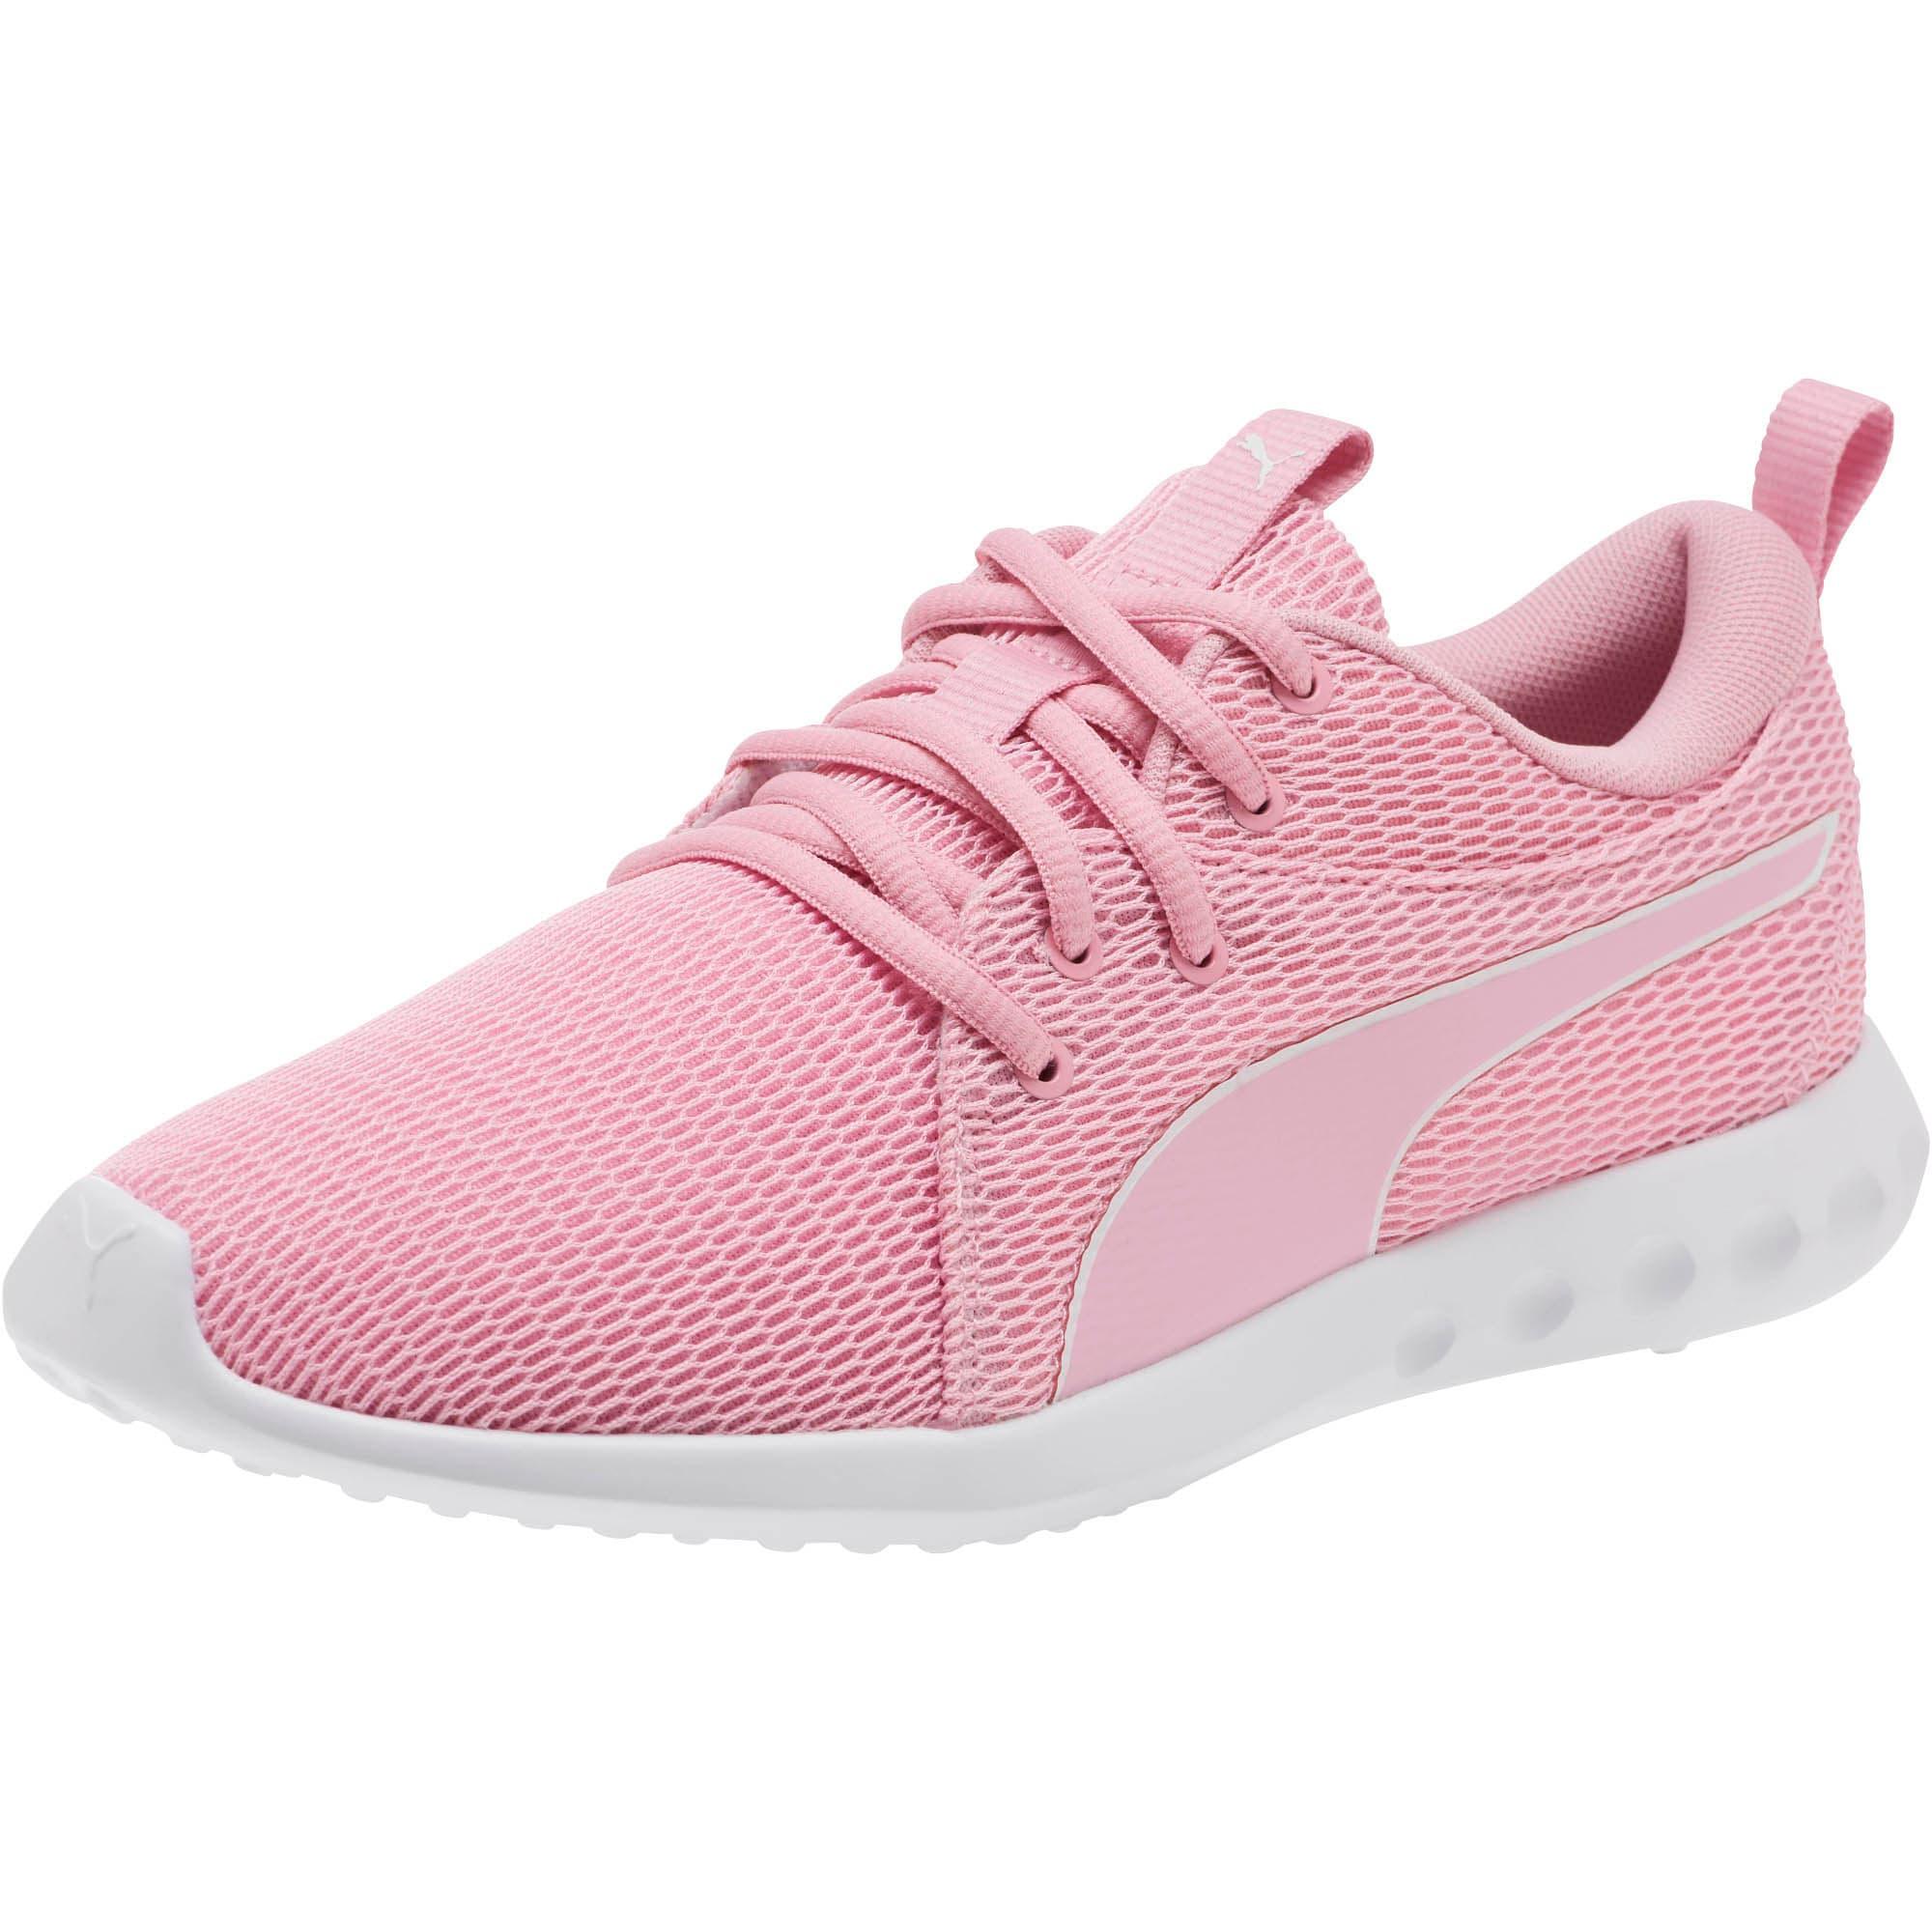 Thumbnail 1 of Carson 2 New Core Women's Training Shoes, Pale Pink-Puma White, medium